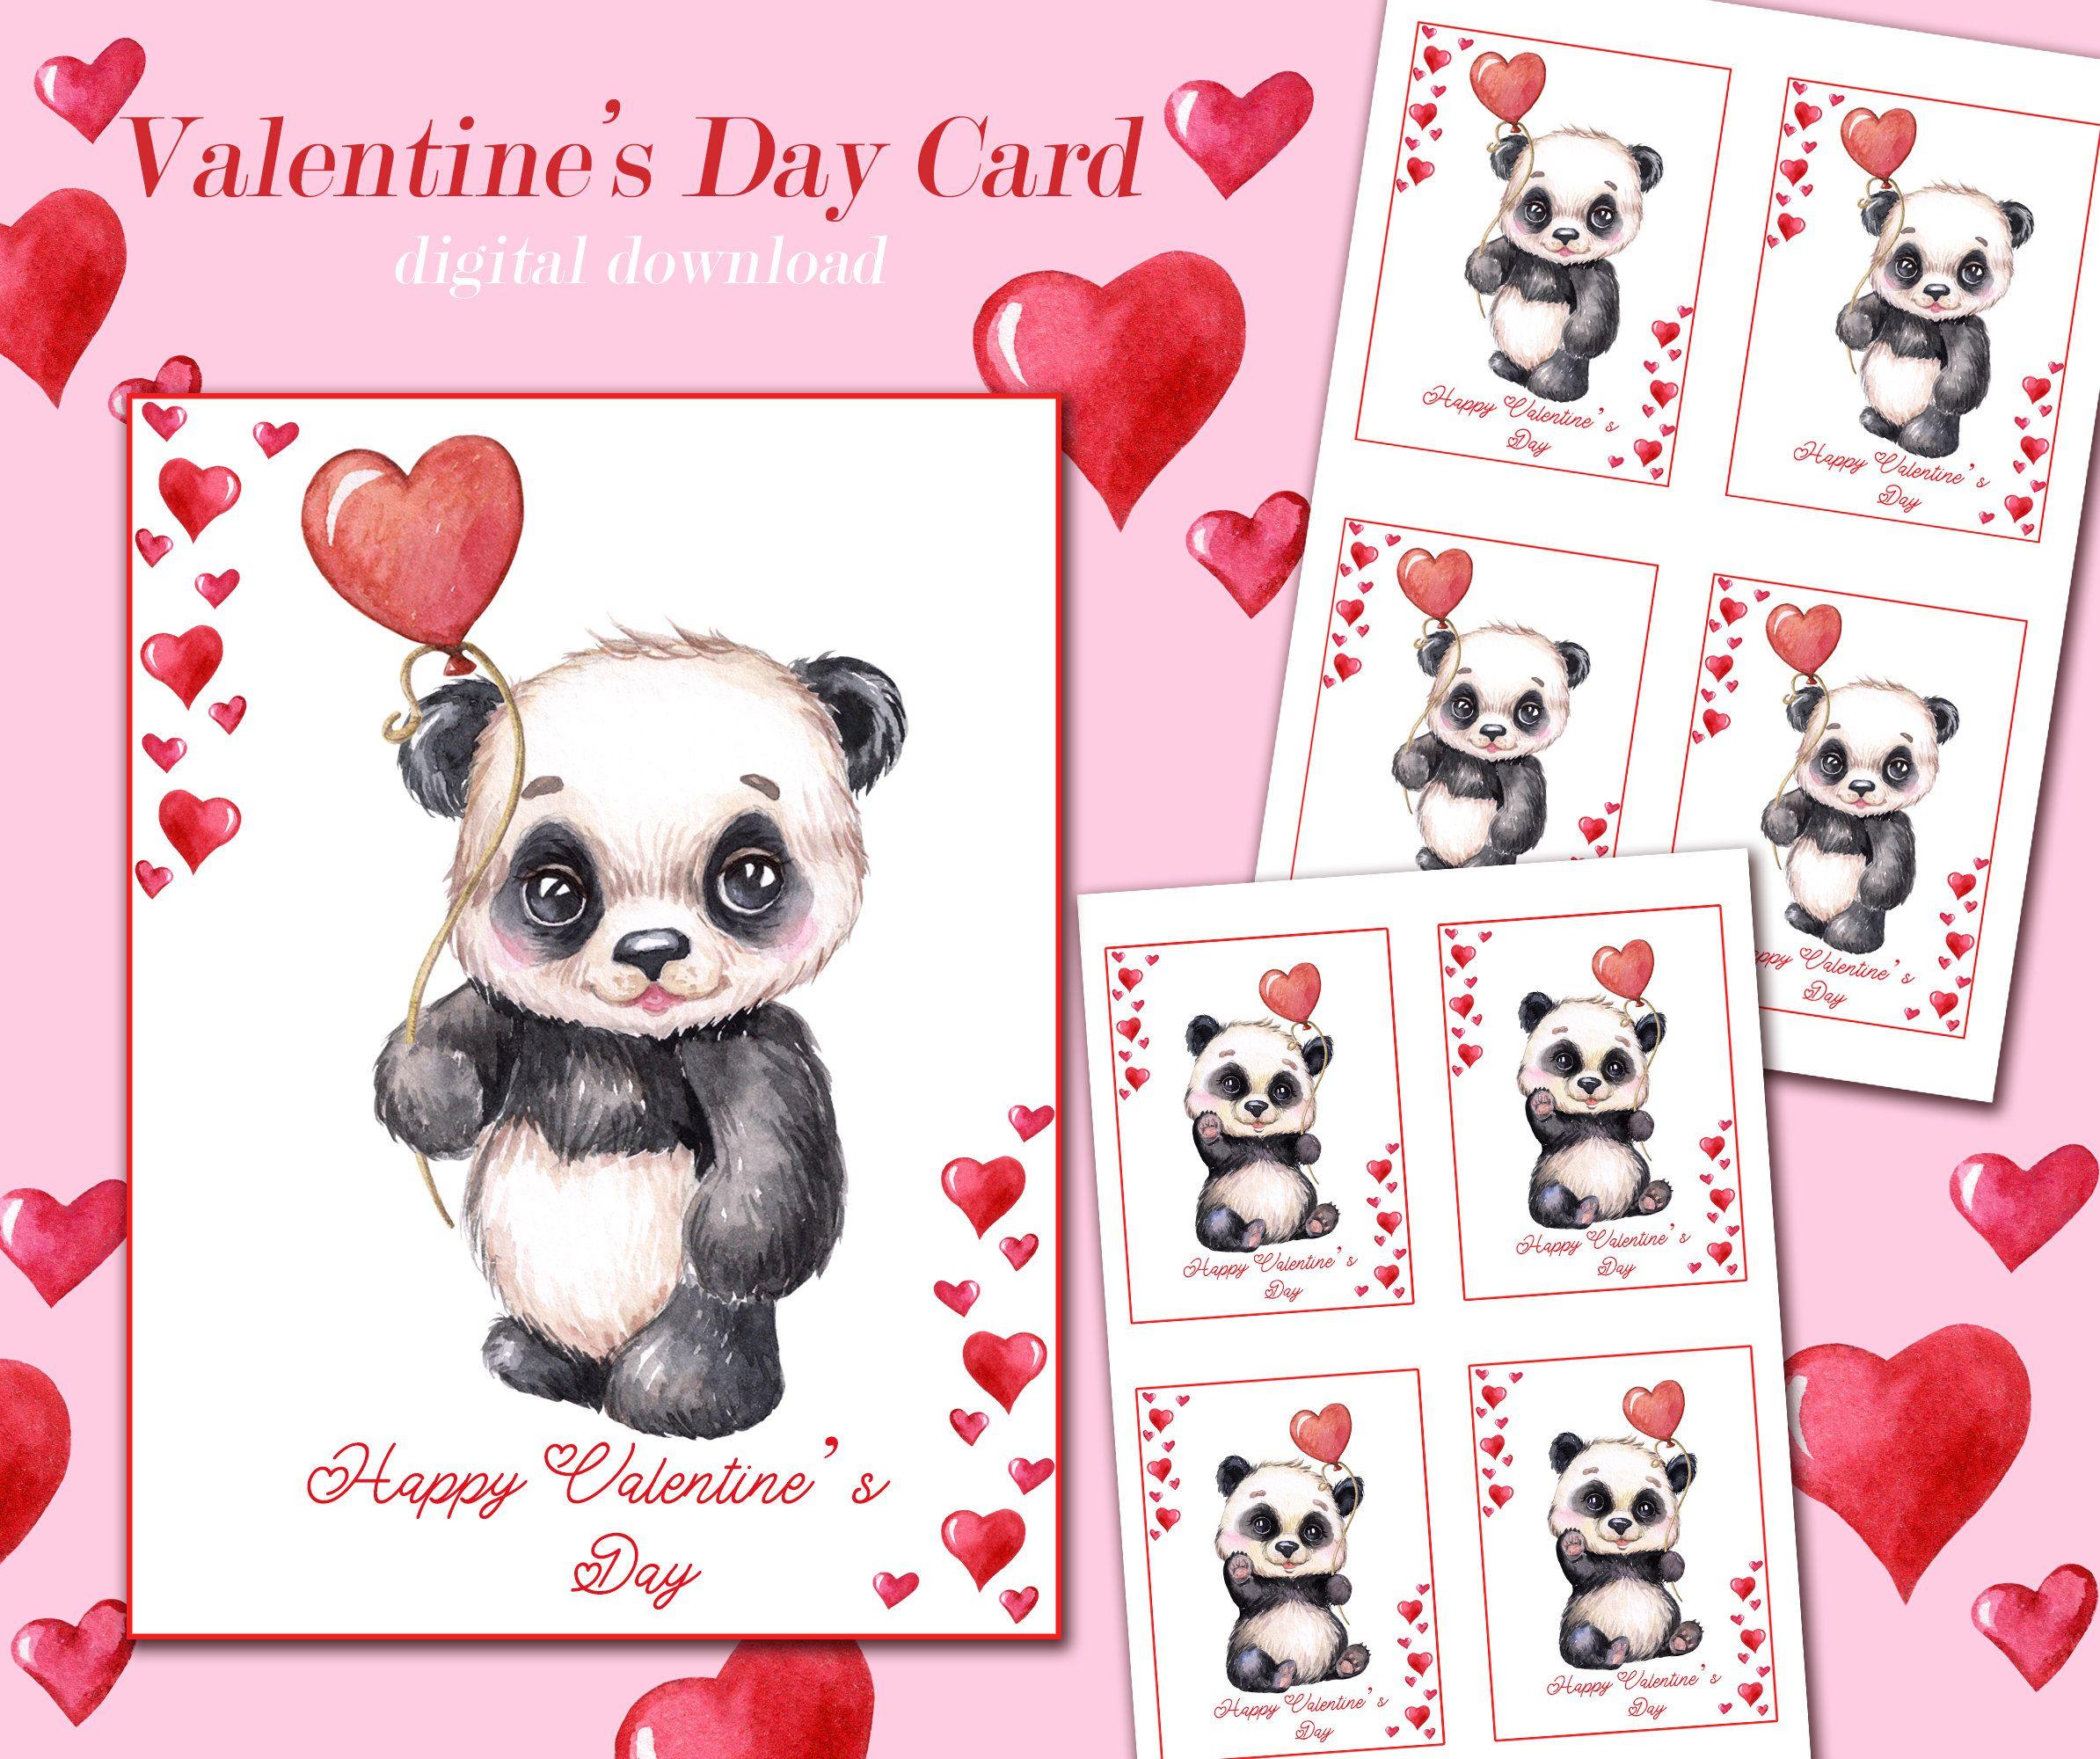 Panda Valentines Card Panda Lovely Valentine S Day